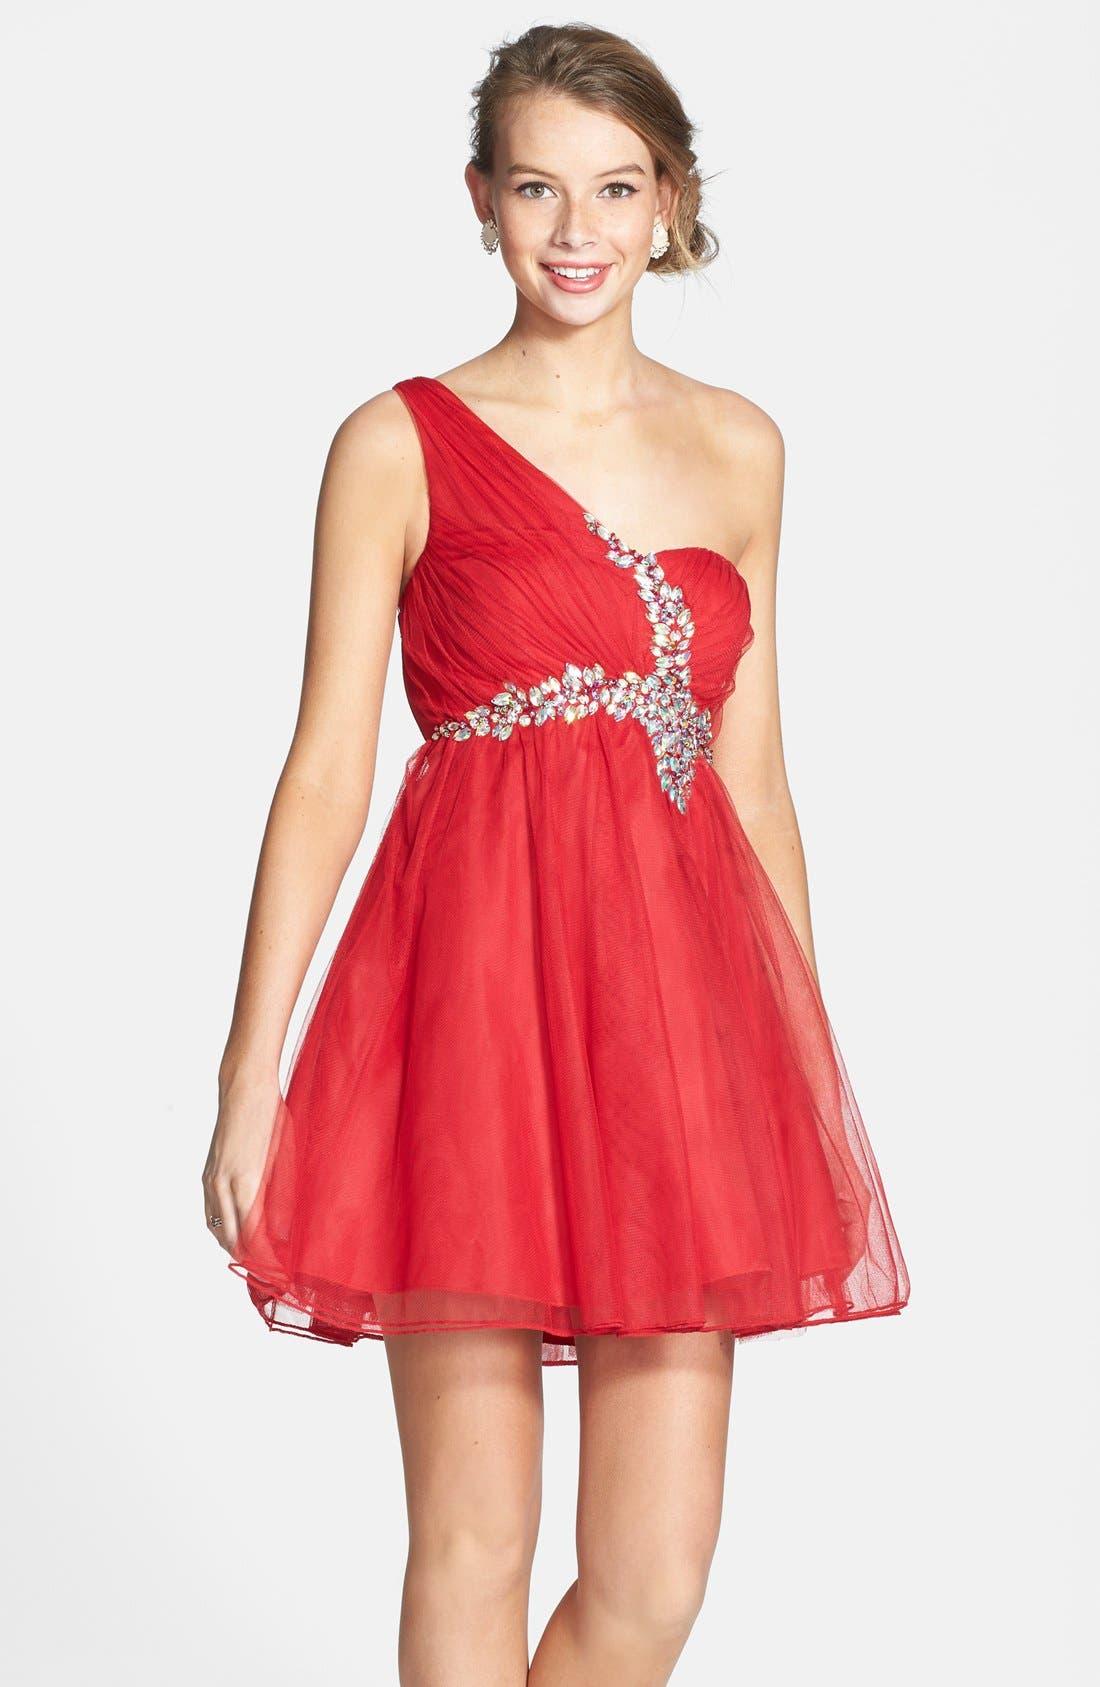 Main Image - Sequin Hearts Single Shoulder Party Dress (Juniors)